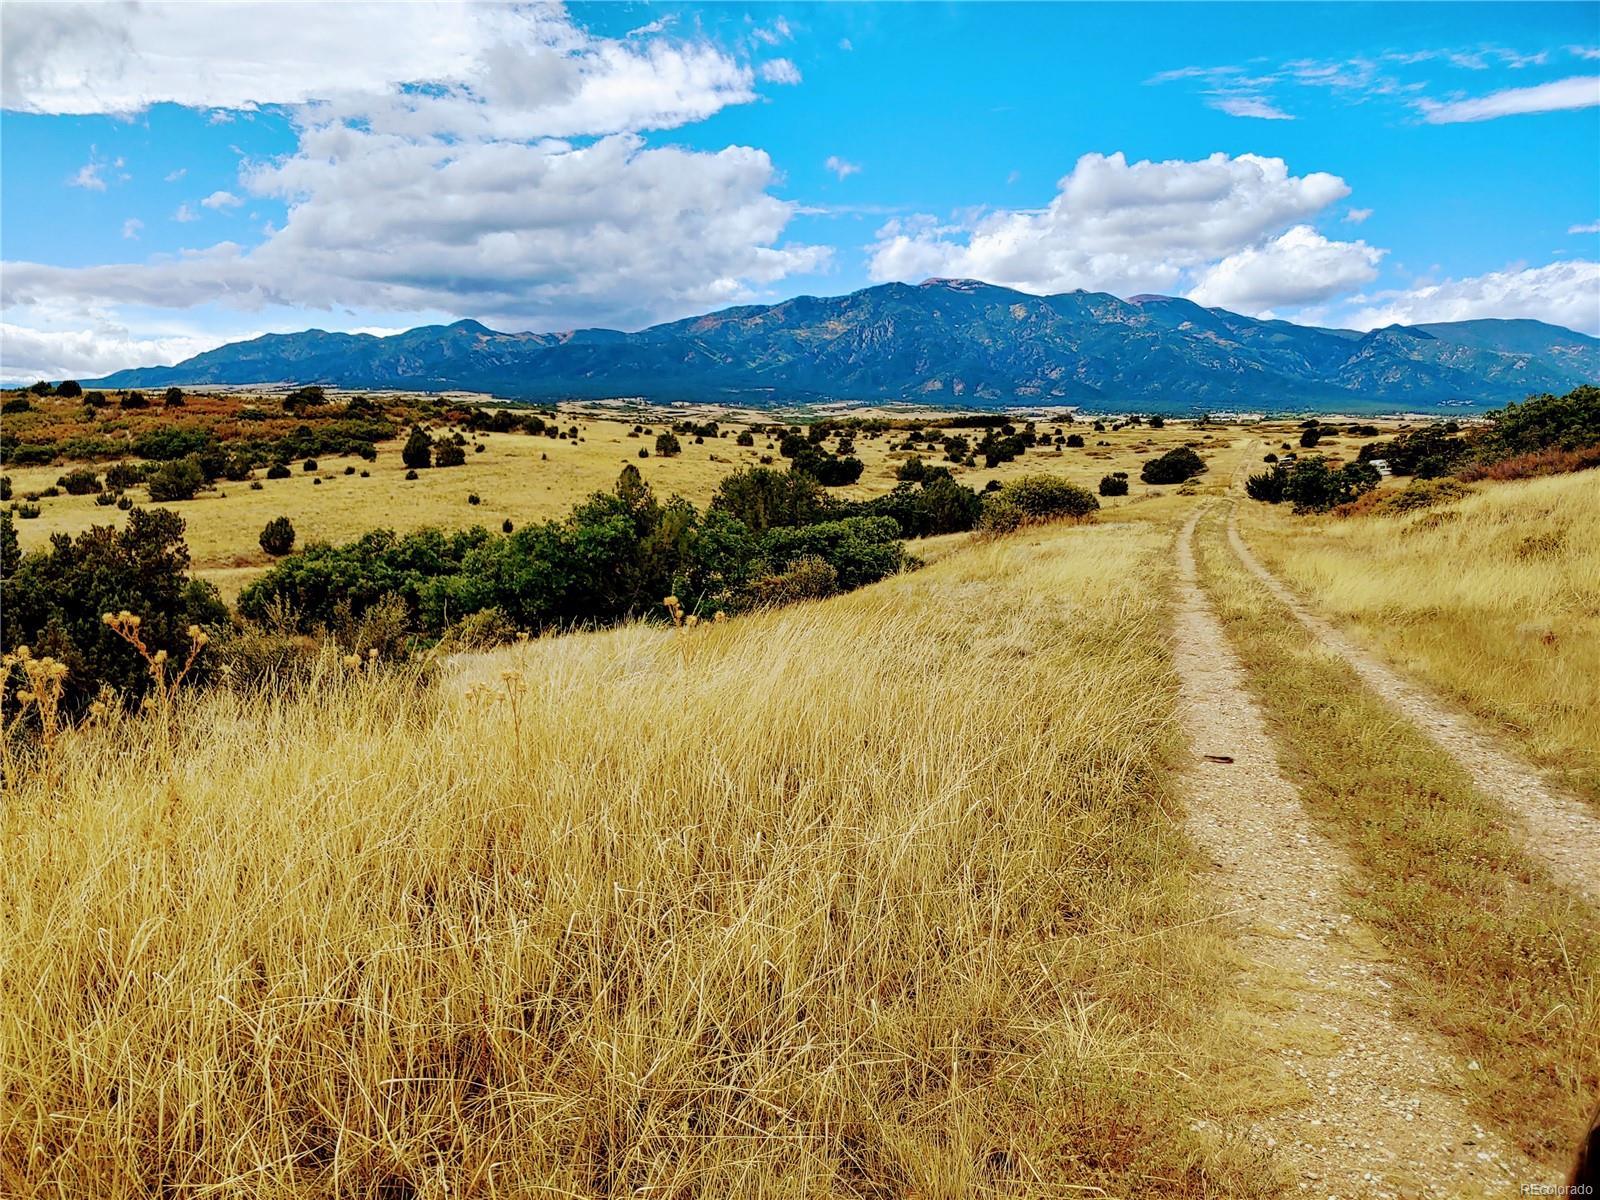 000 Greenhorn Road, Colorado City, CO 81019 - Colorado City, CO real estate listing